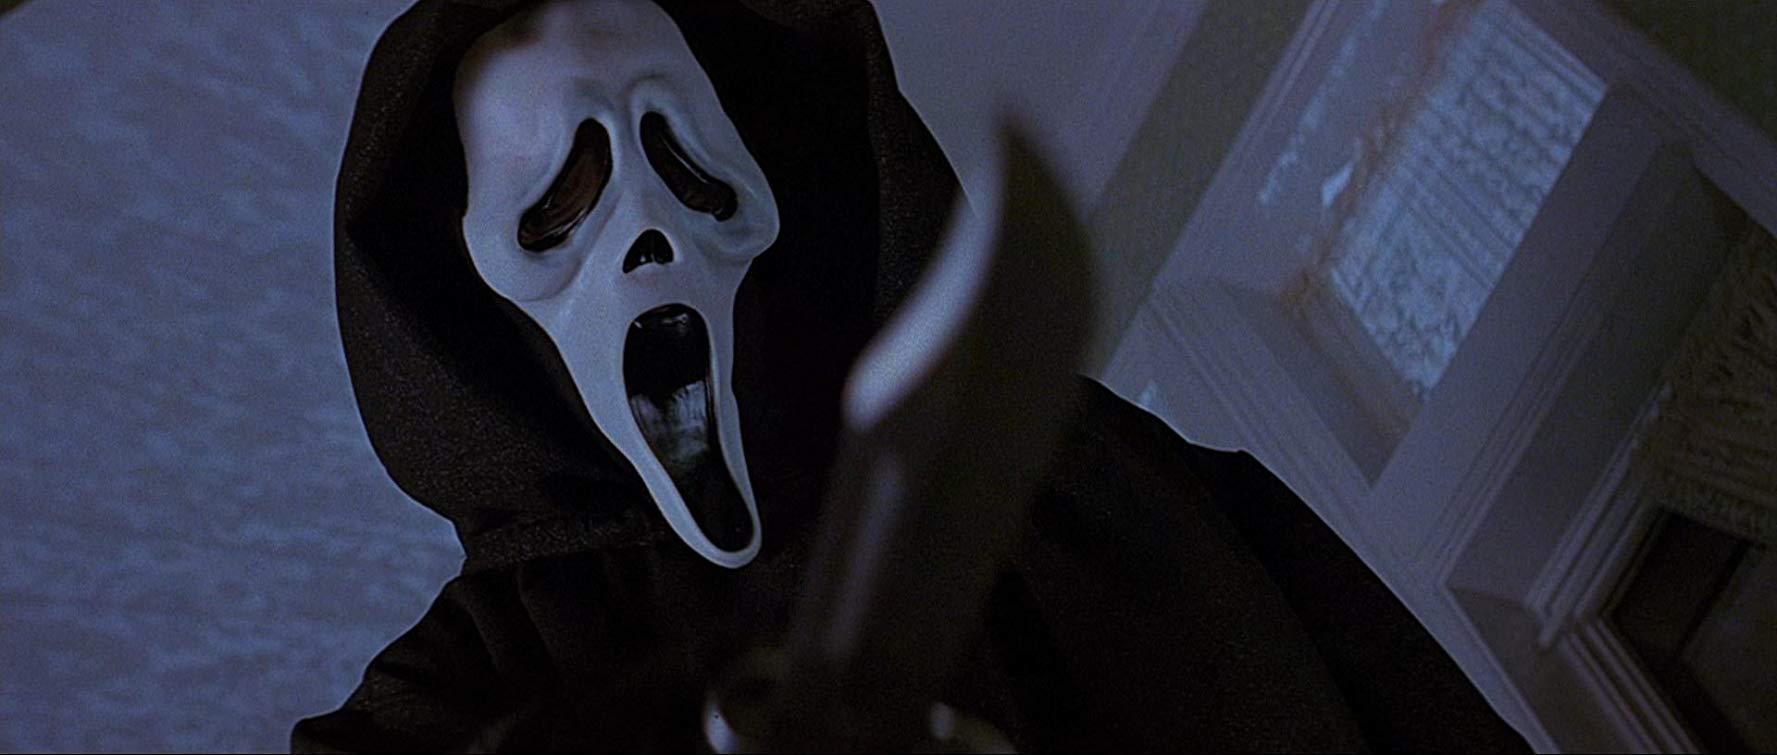 20 movies to watch on halloween 15.jpg